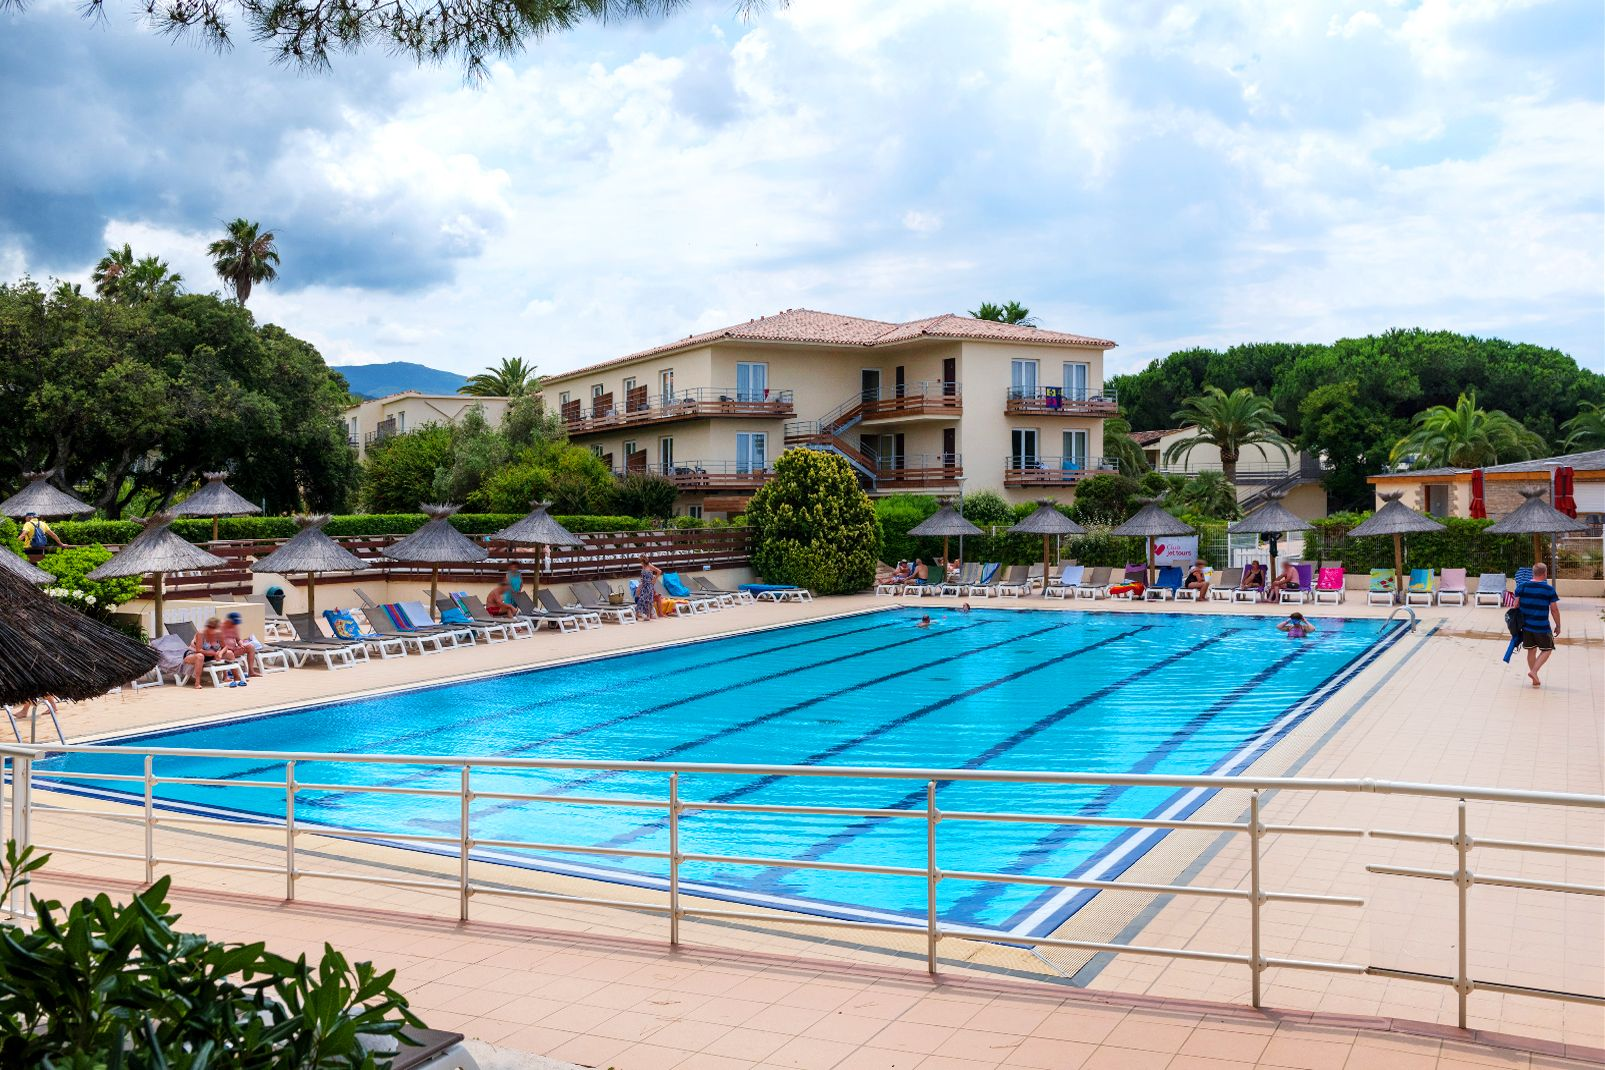 Club Marina Viva - Location - 1